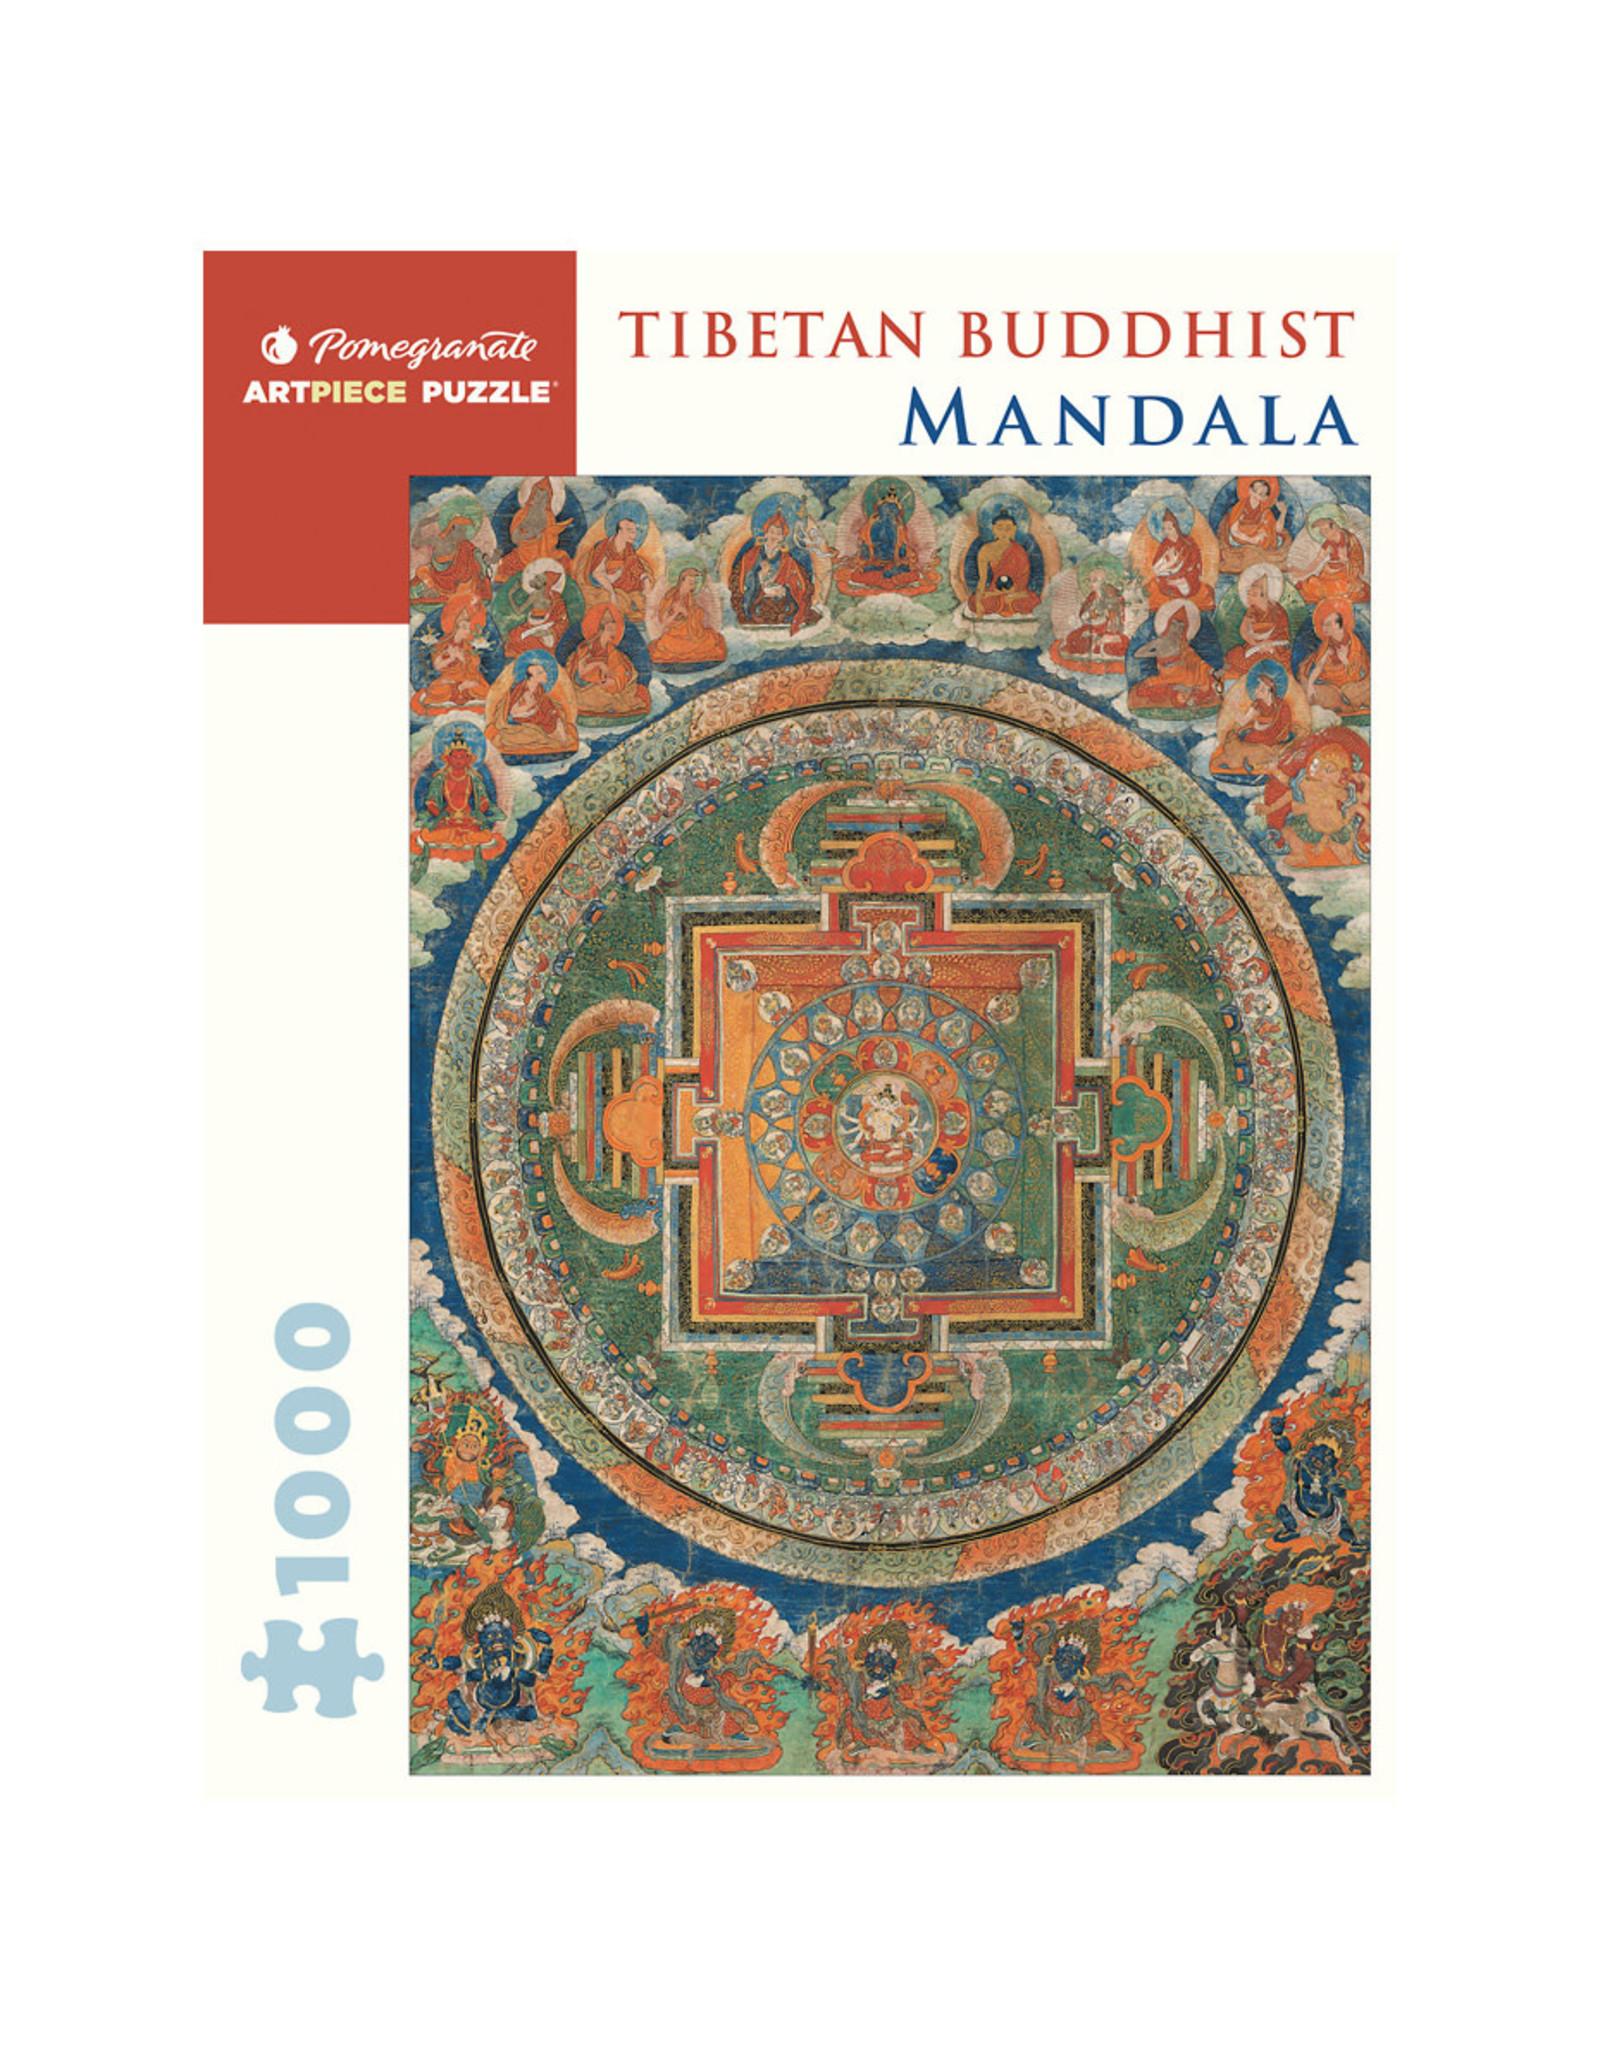 Pomegranate Tibetan Buddhist Mandala 1000-piece Jigsaw Puzzle